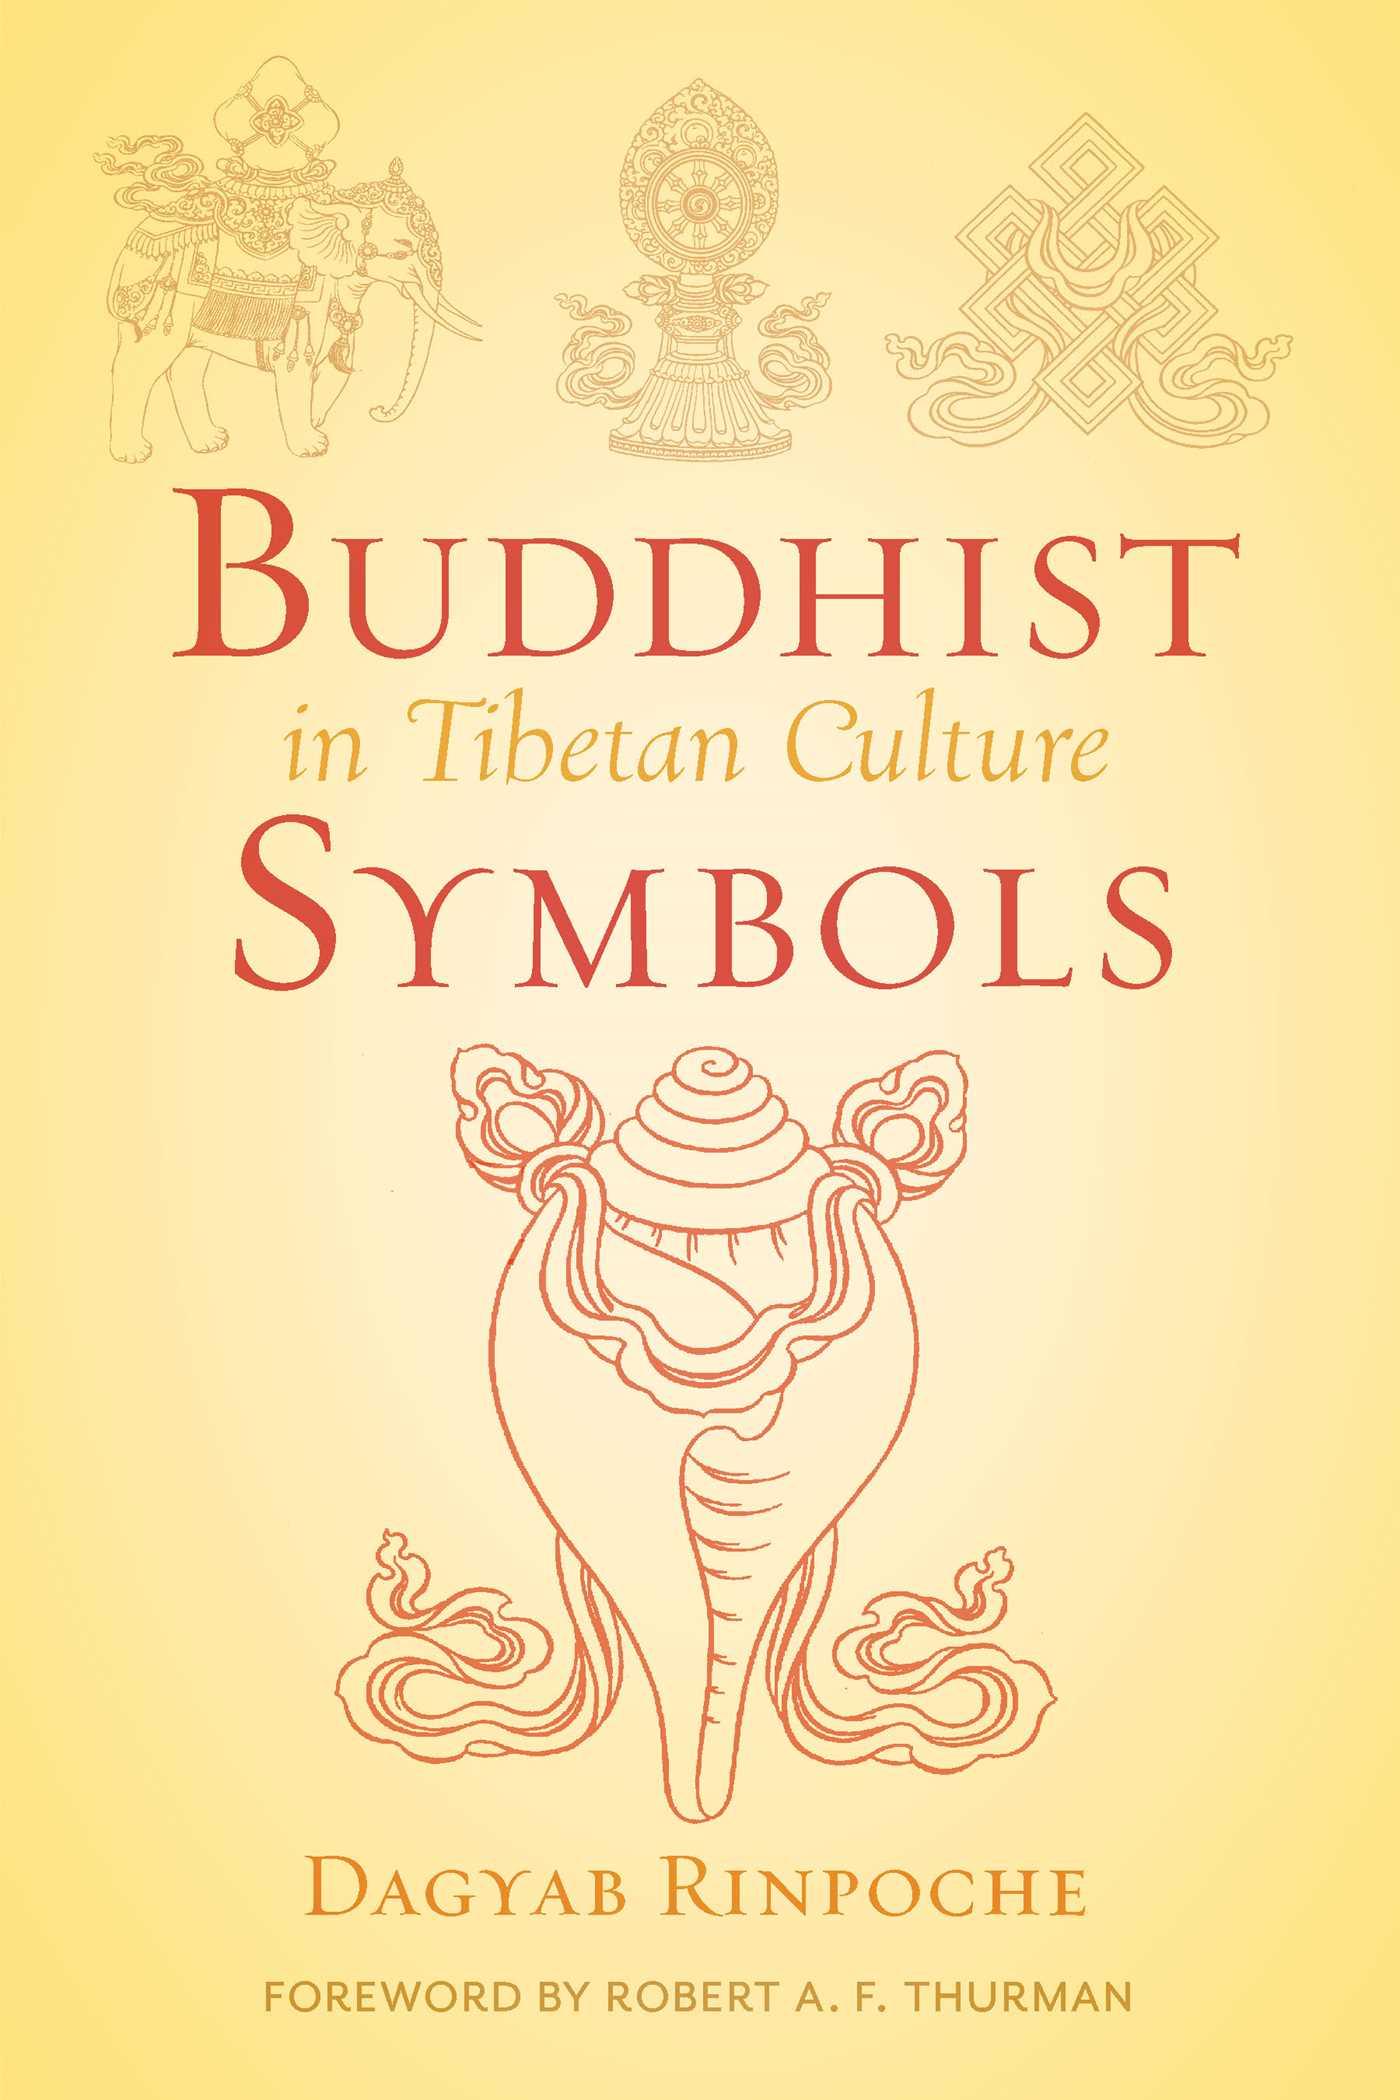 Buddhist Symbols In Tibetan Culture Book By Loden Sherap Dagyab